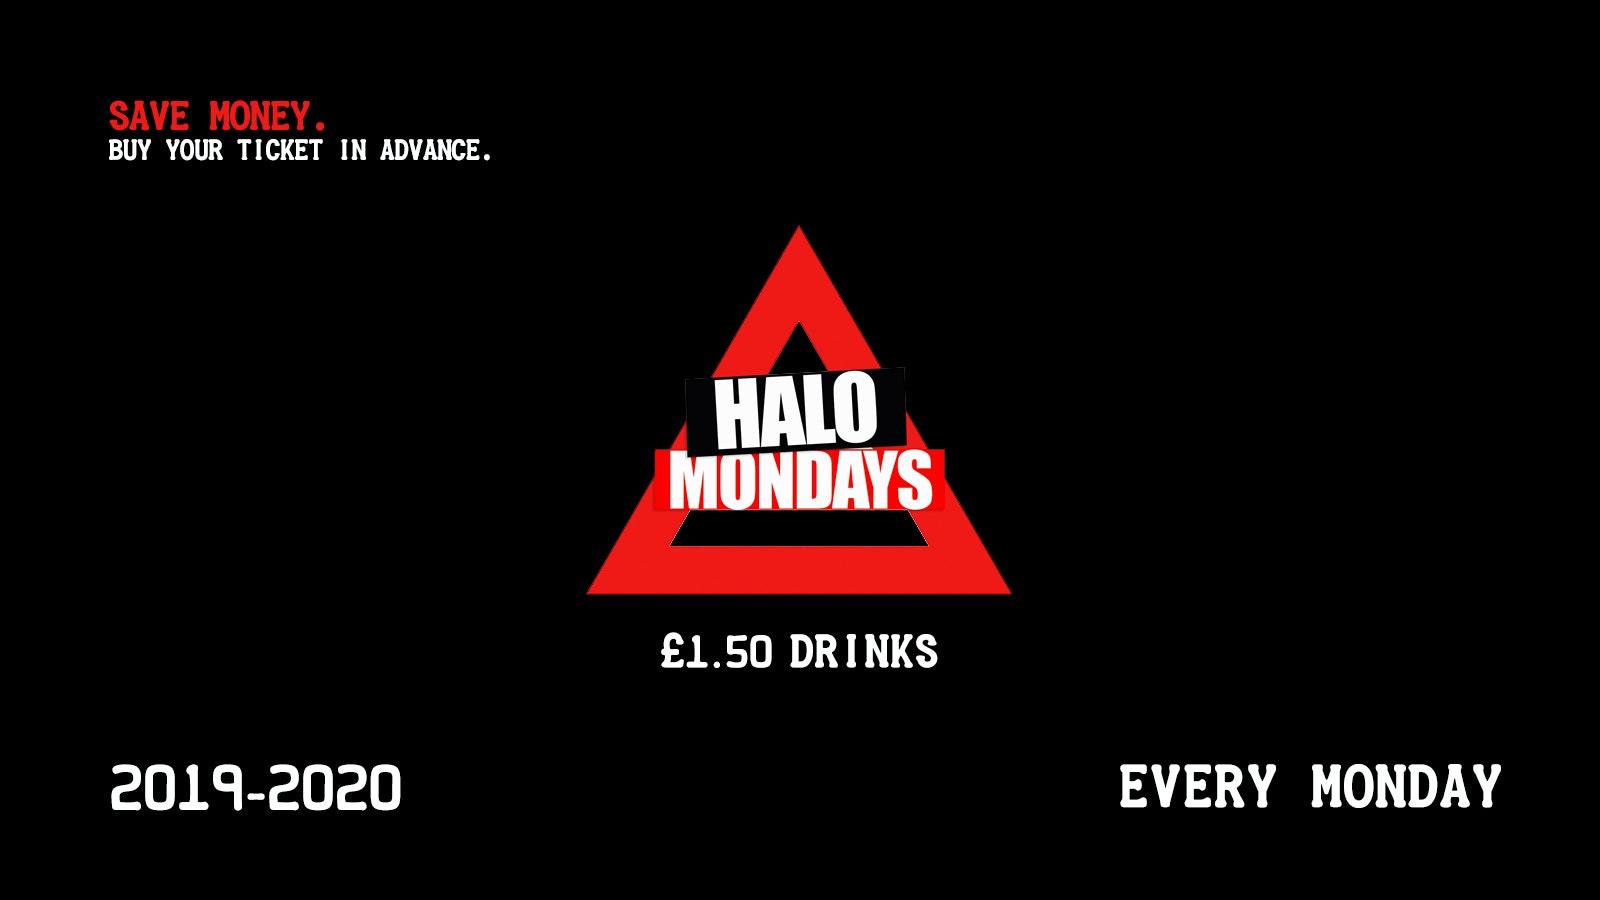 HALO EVERY MONDAY – TERM 1